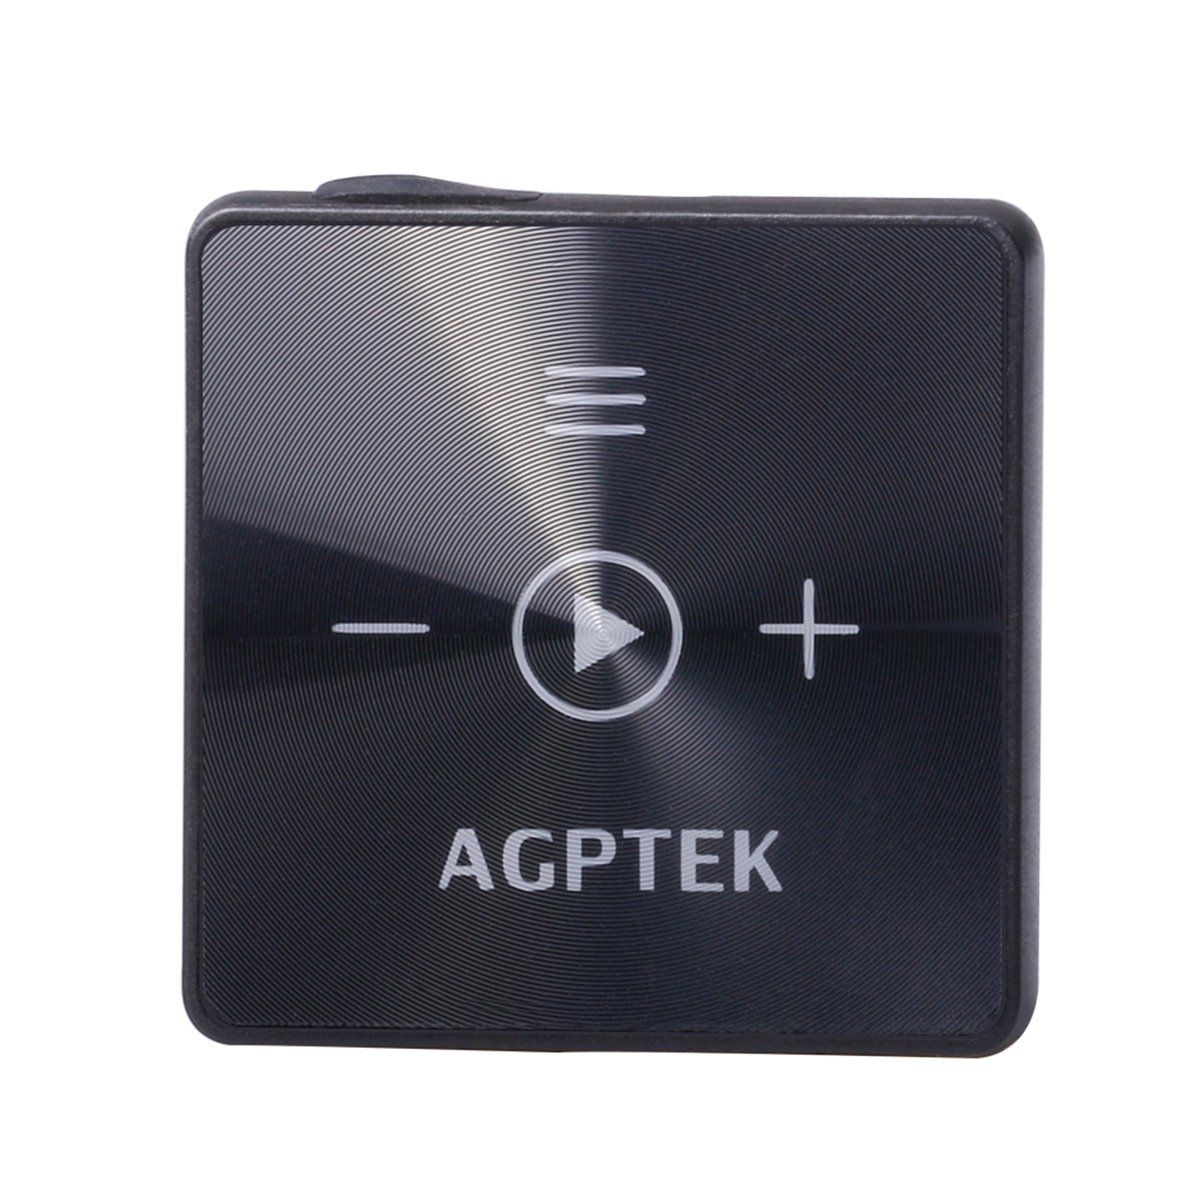 AGPtEK A15 8GB Bluetooth 4.2 MP3 Player,Sports Clip,HIFI